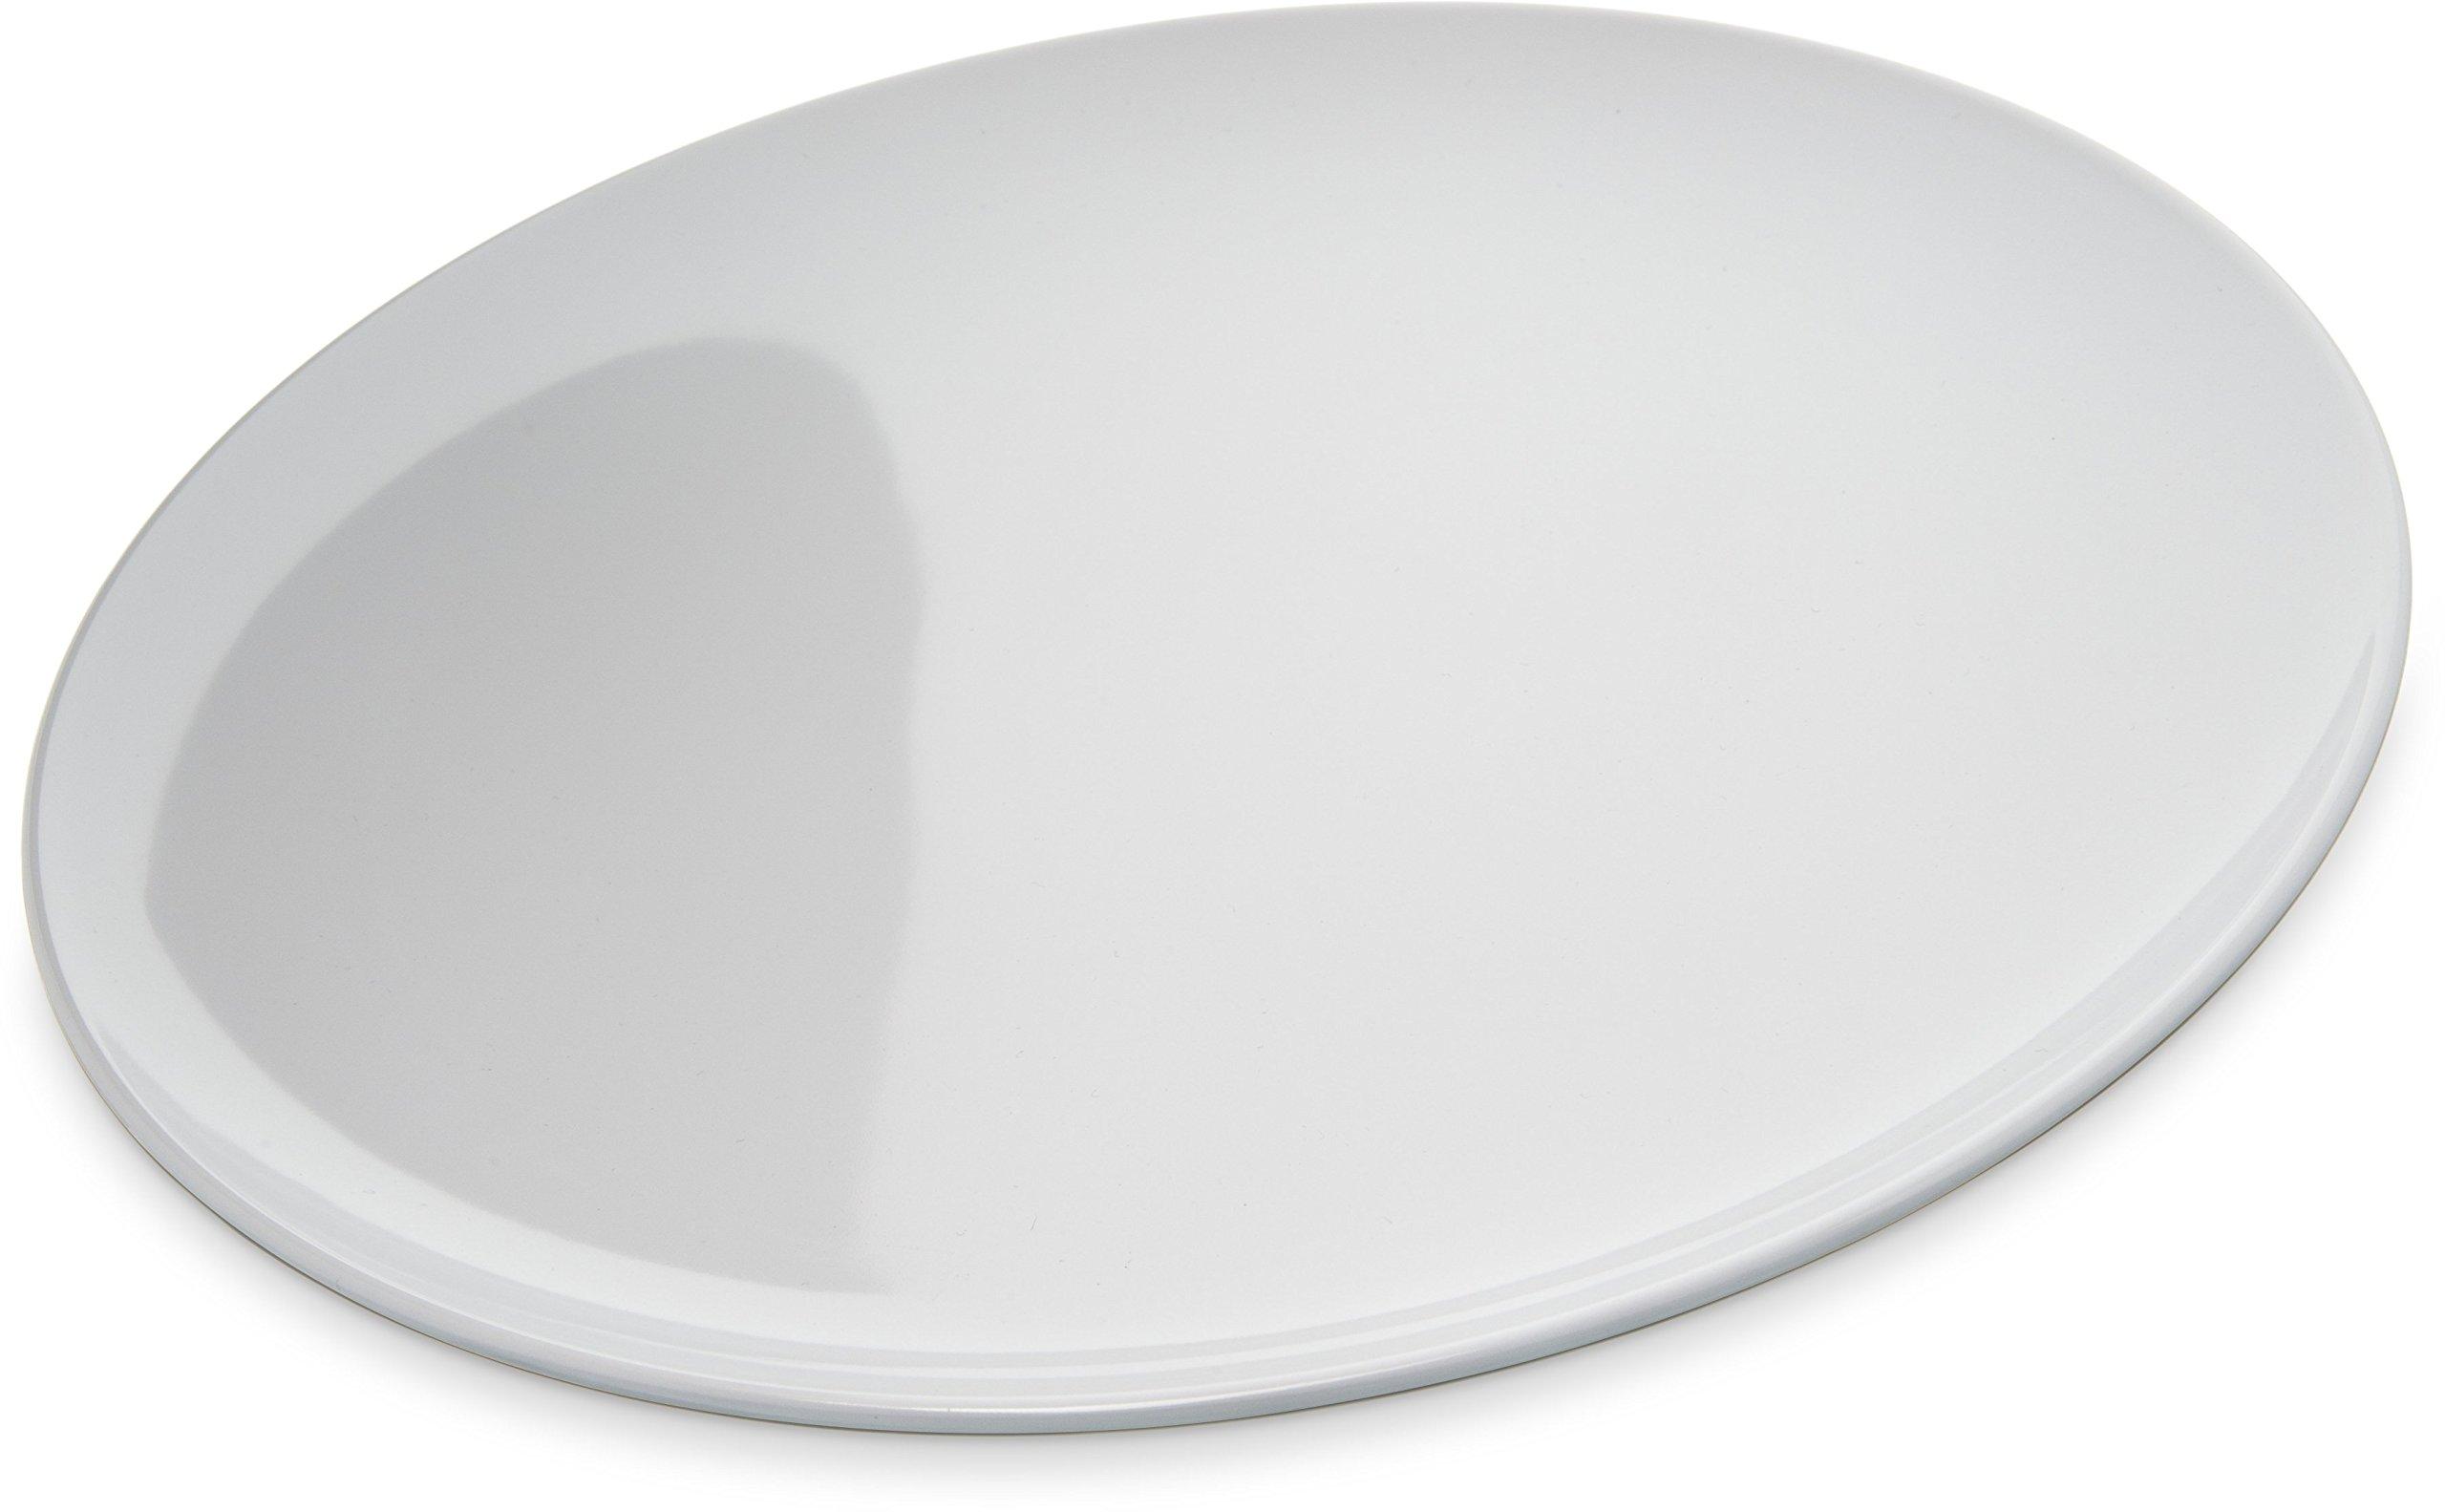 Carlisle 4380002 Epicure Melamine Buffet / Pizza Plate, 12'', White (Set of 12)